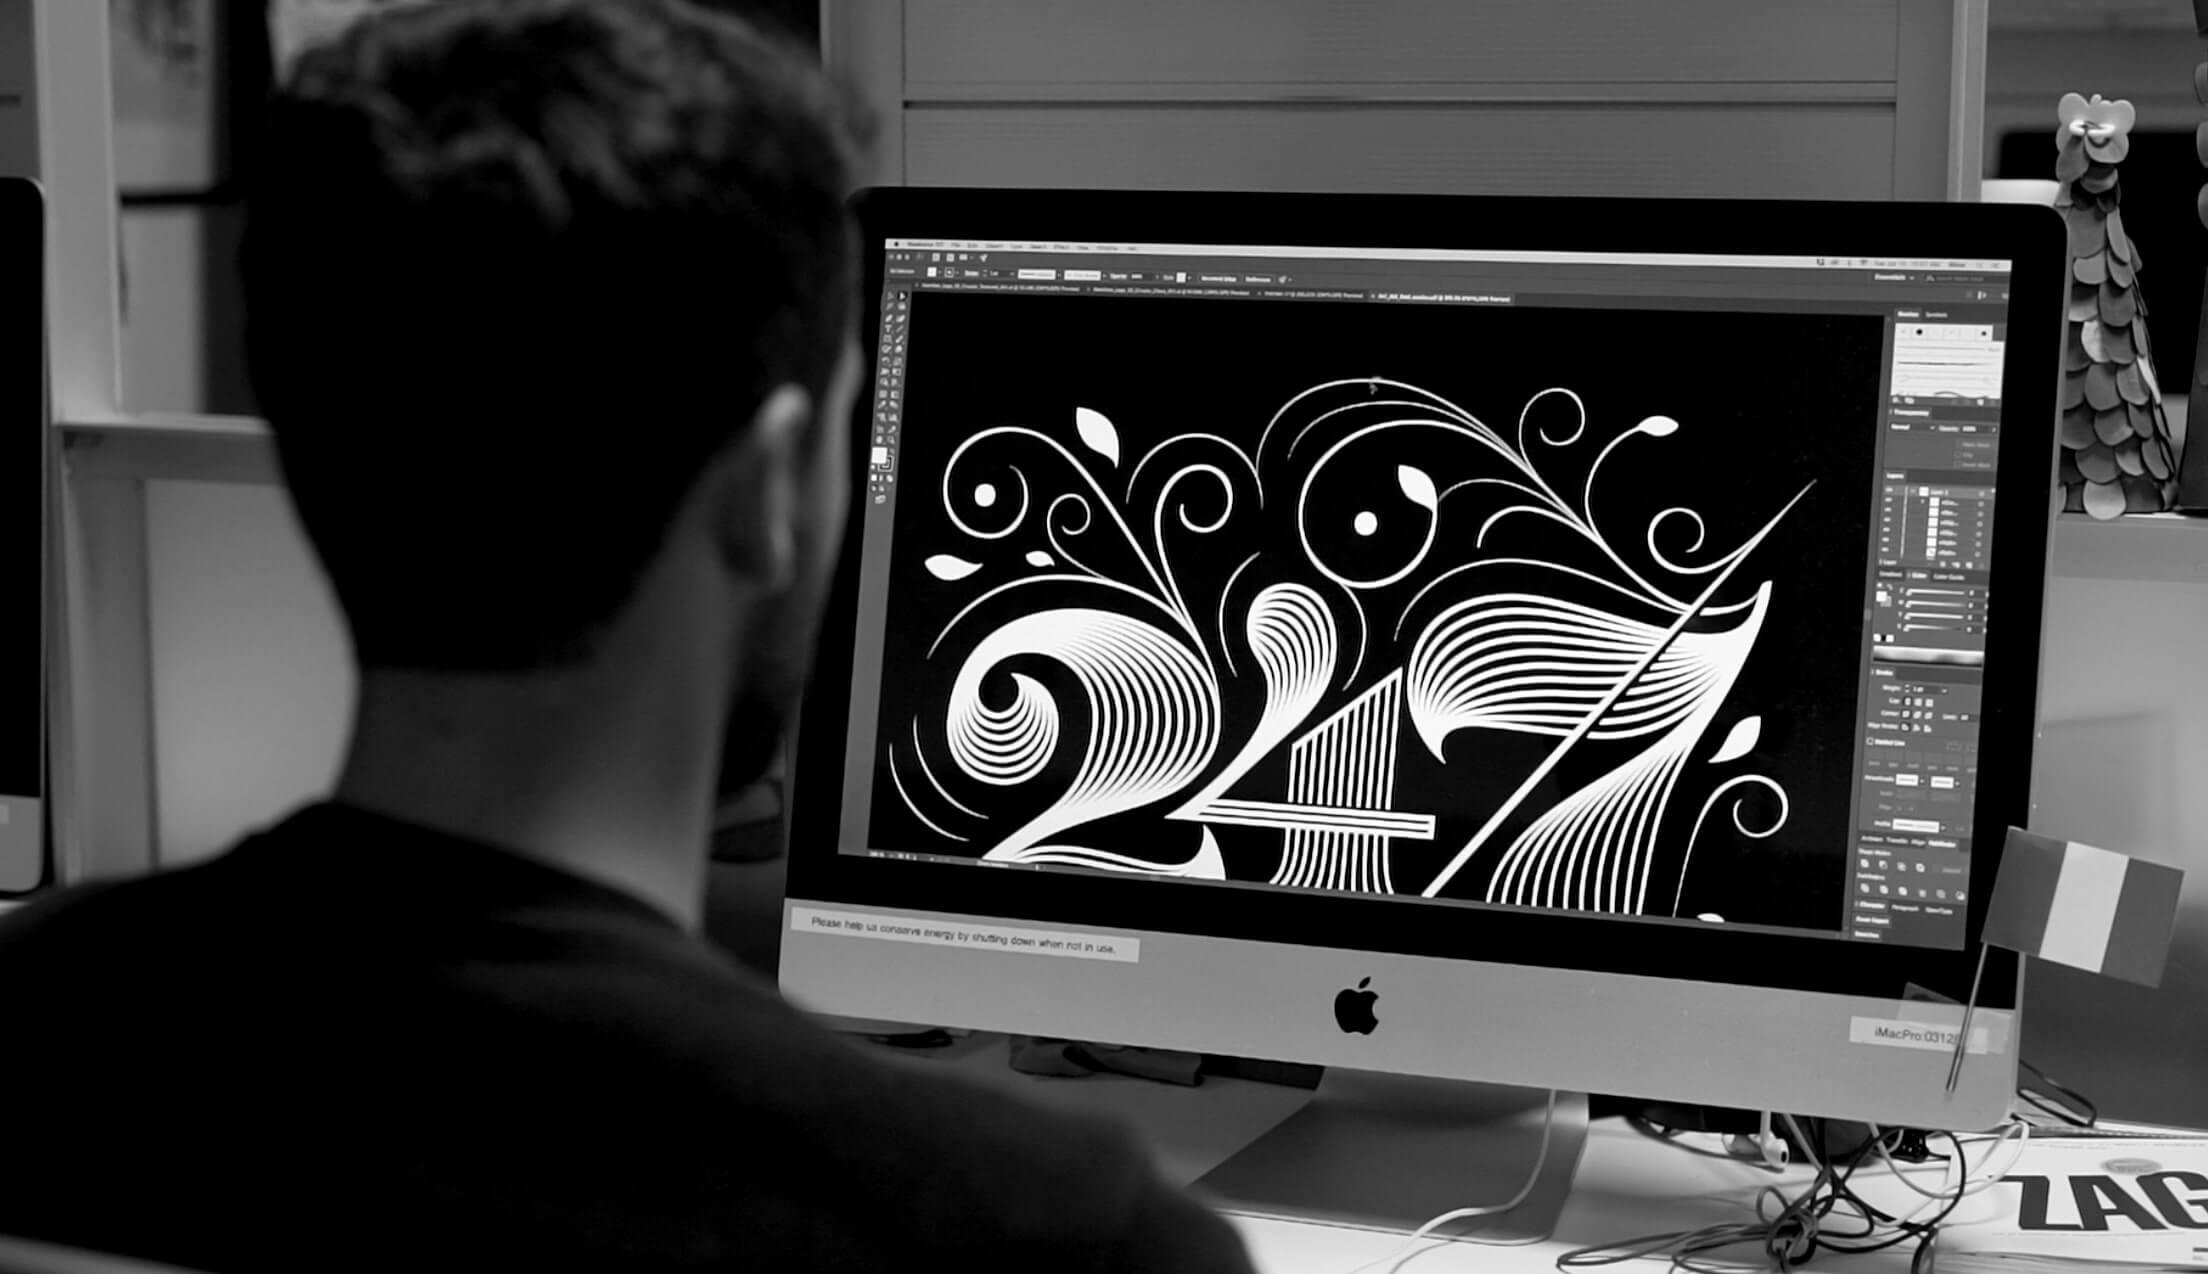 emanuele ricci - graphic design interview